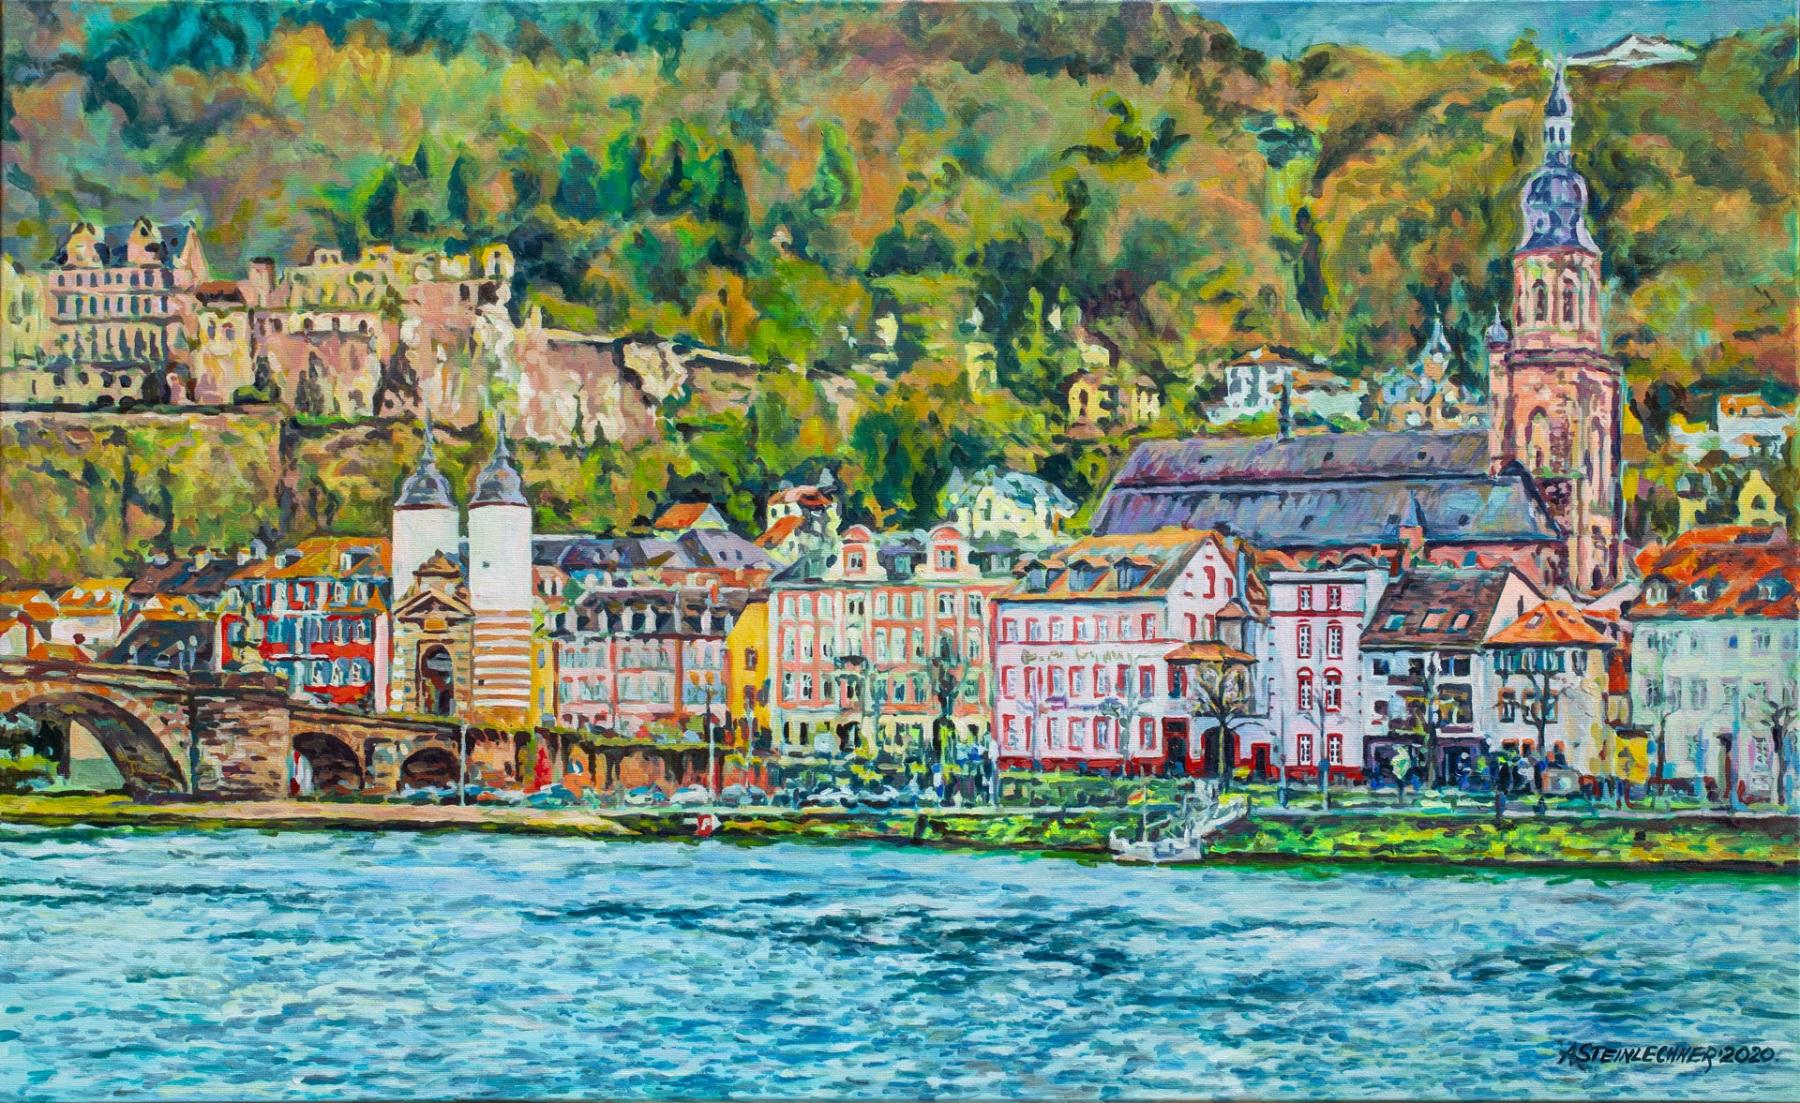 Heidelberg Neckarstaden und Altstadt